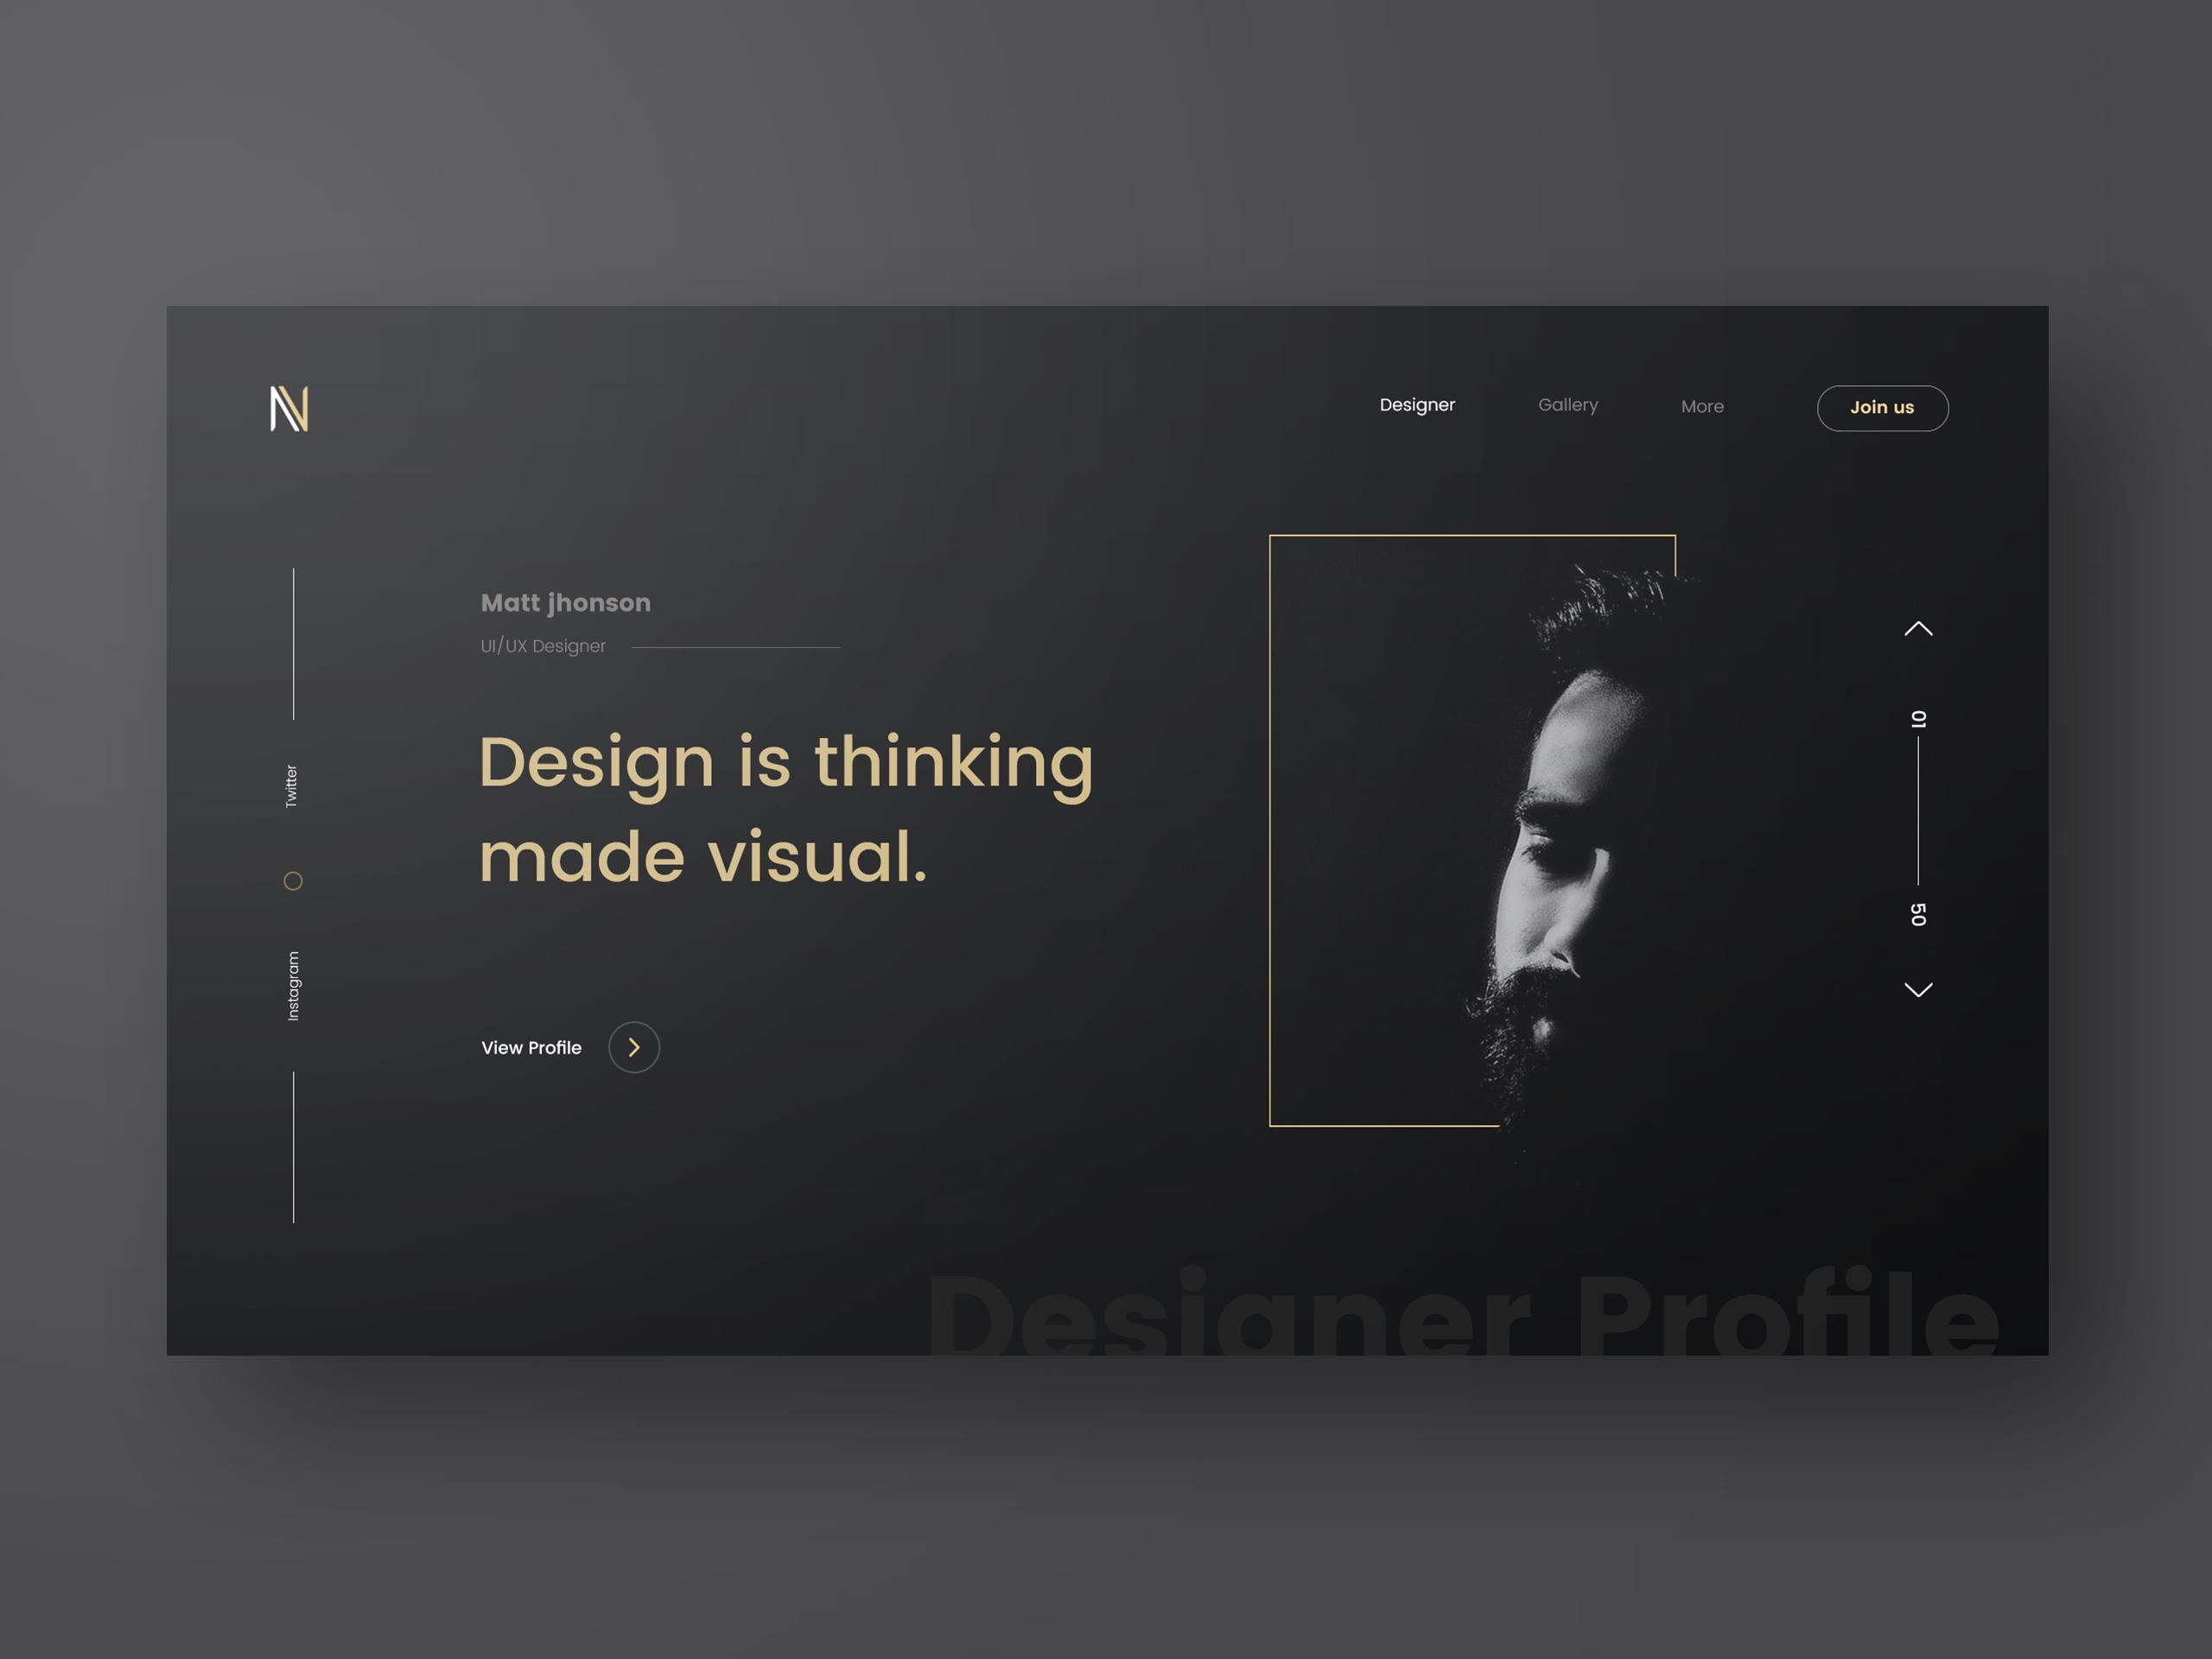 Web Design Inspiration for the Week